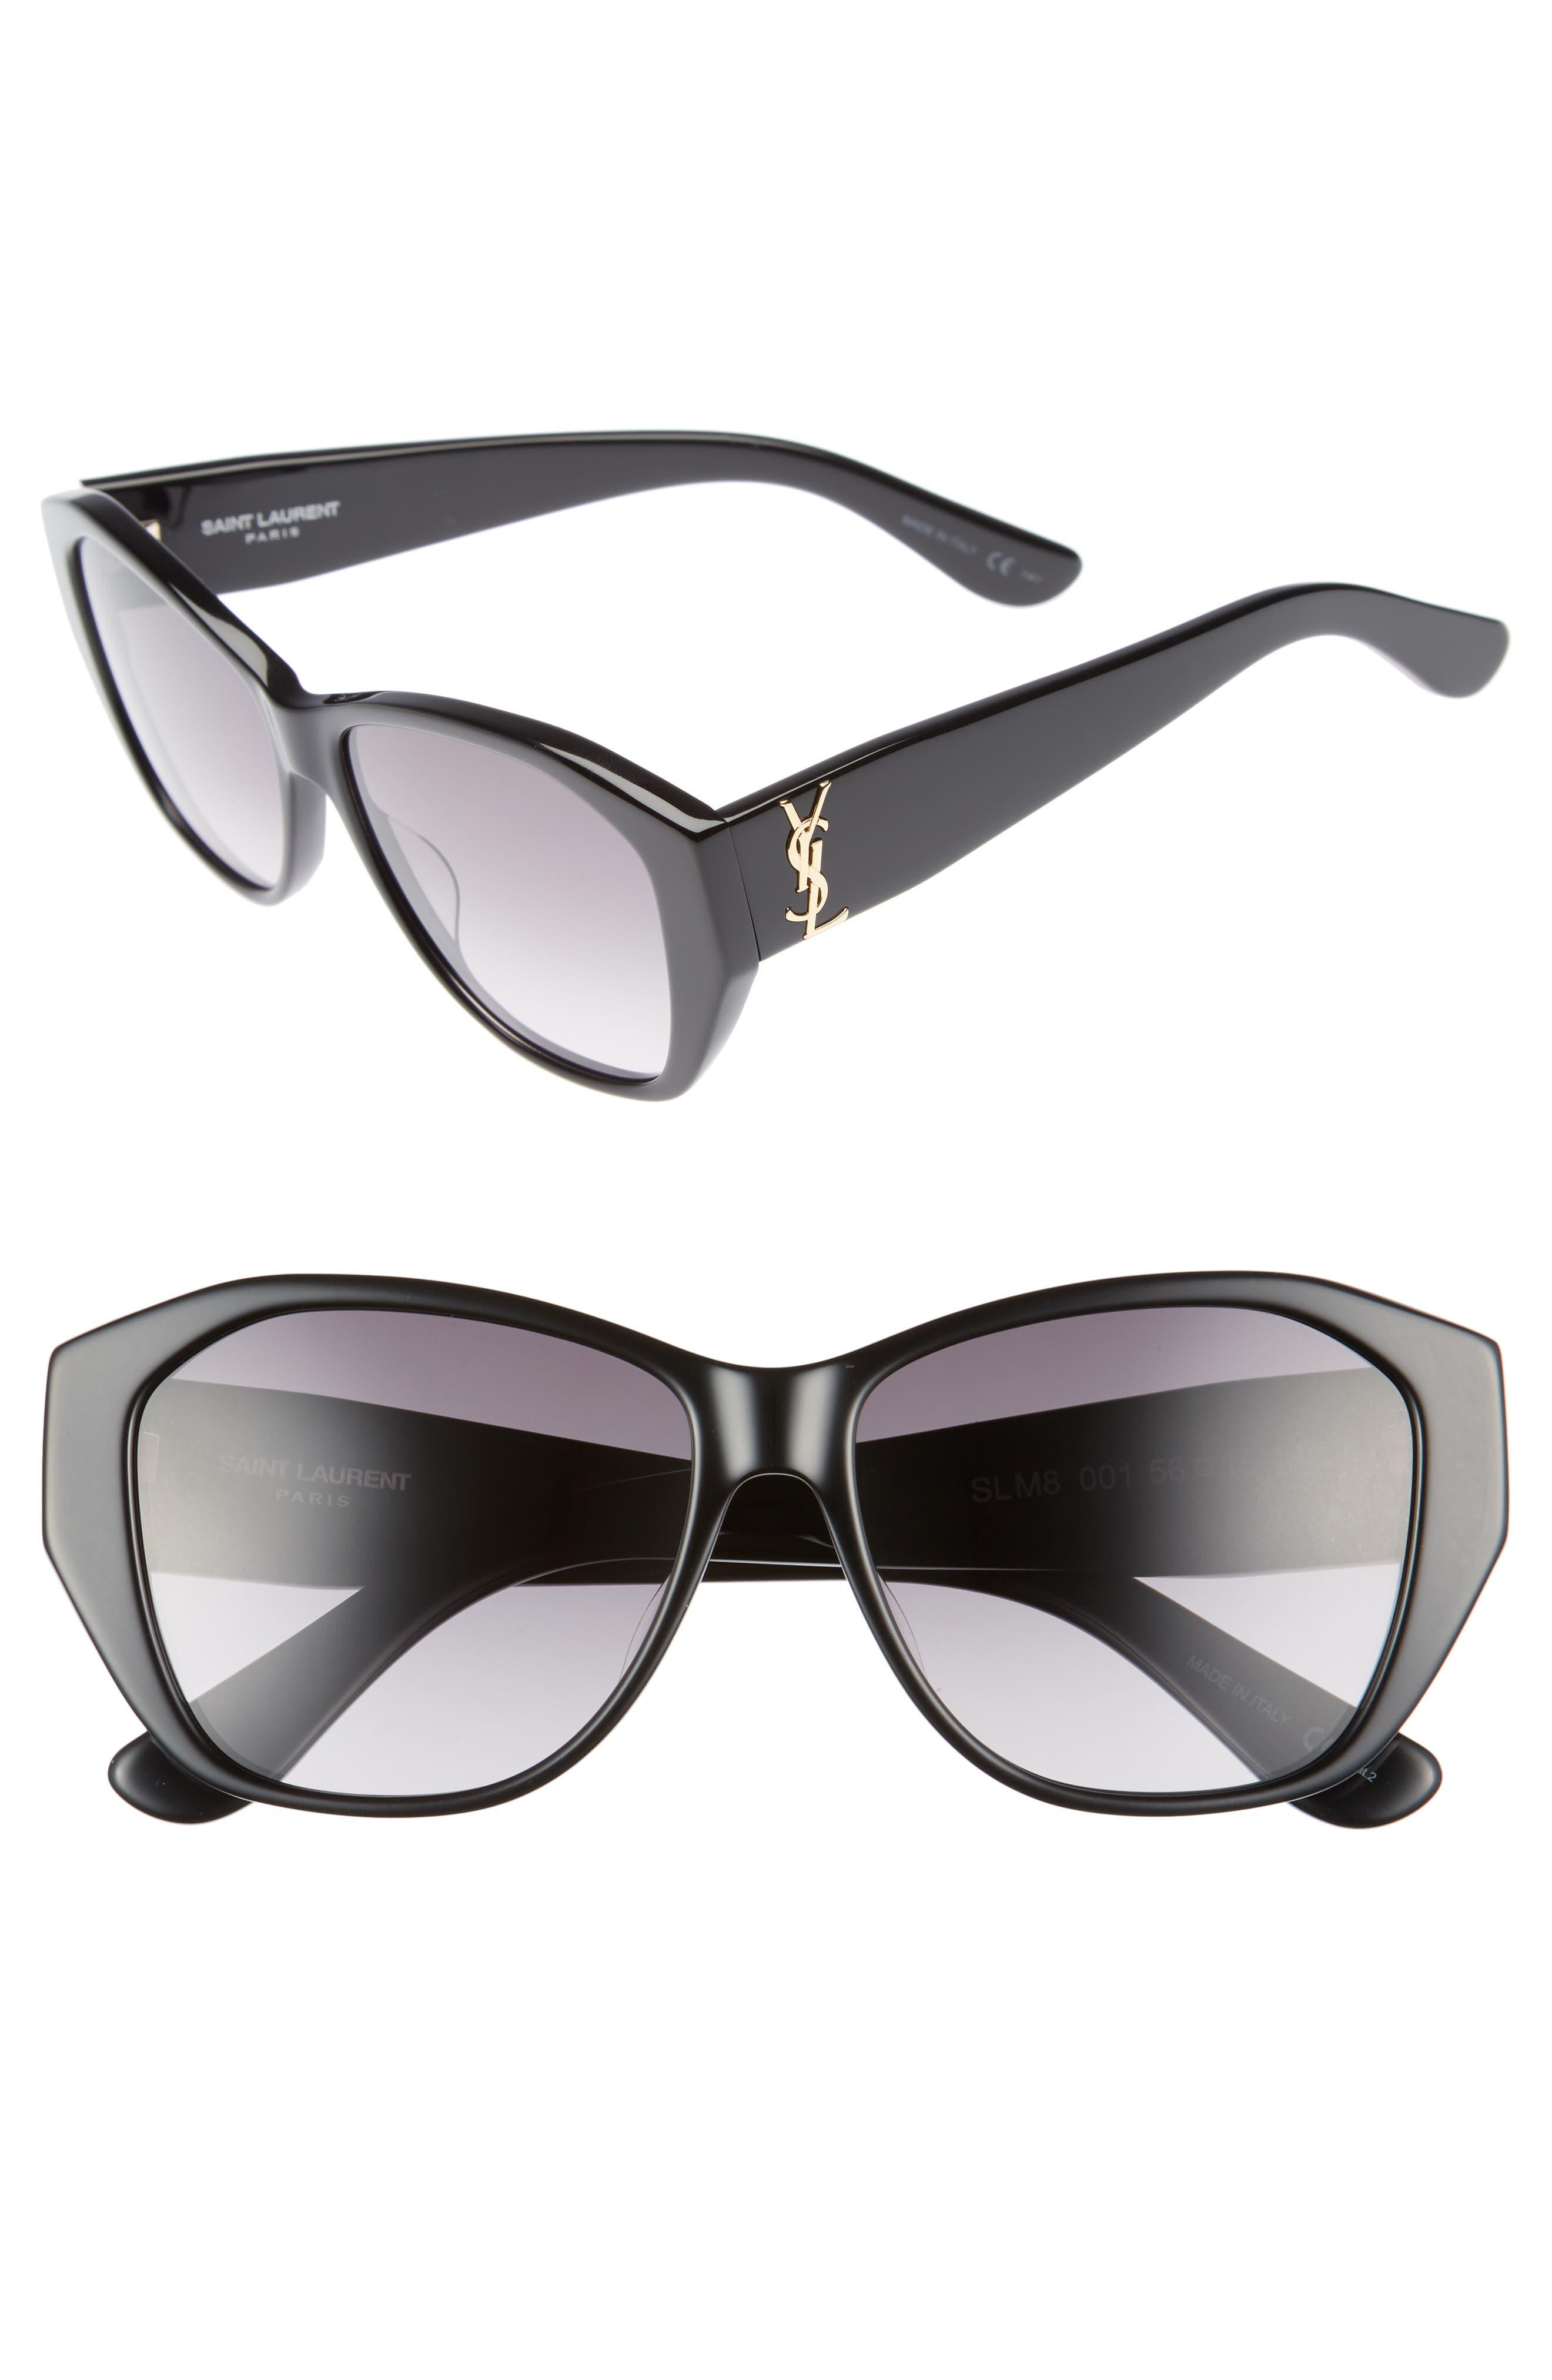 56mm Sunglasses,                         Main,                         color, Black/ Black/ Grey